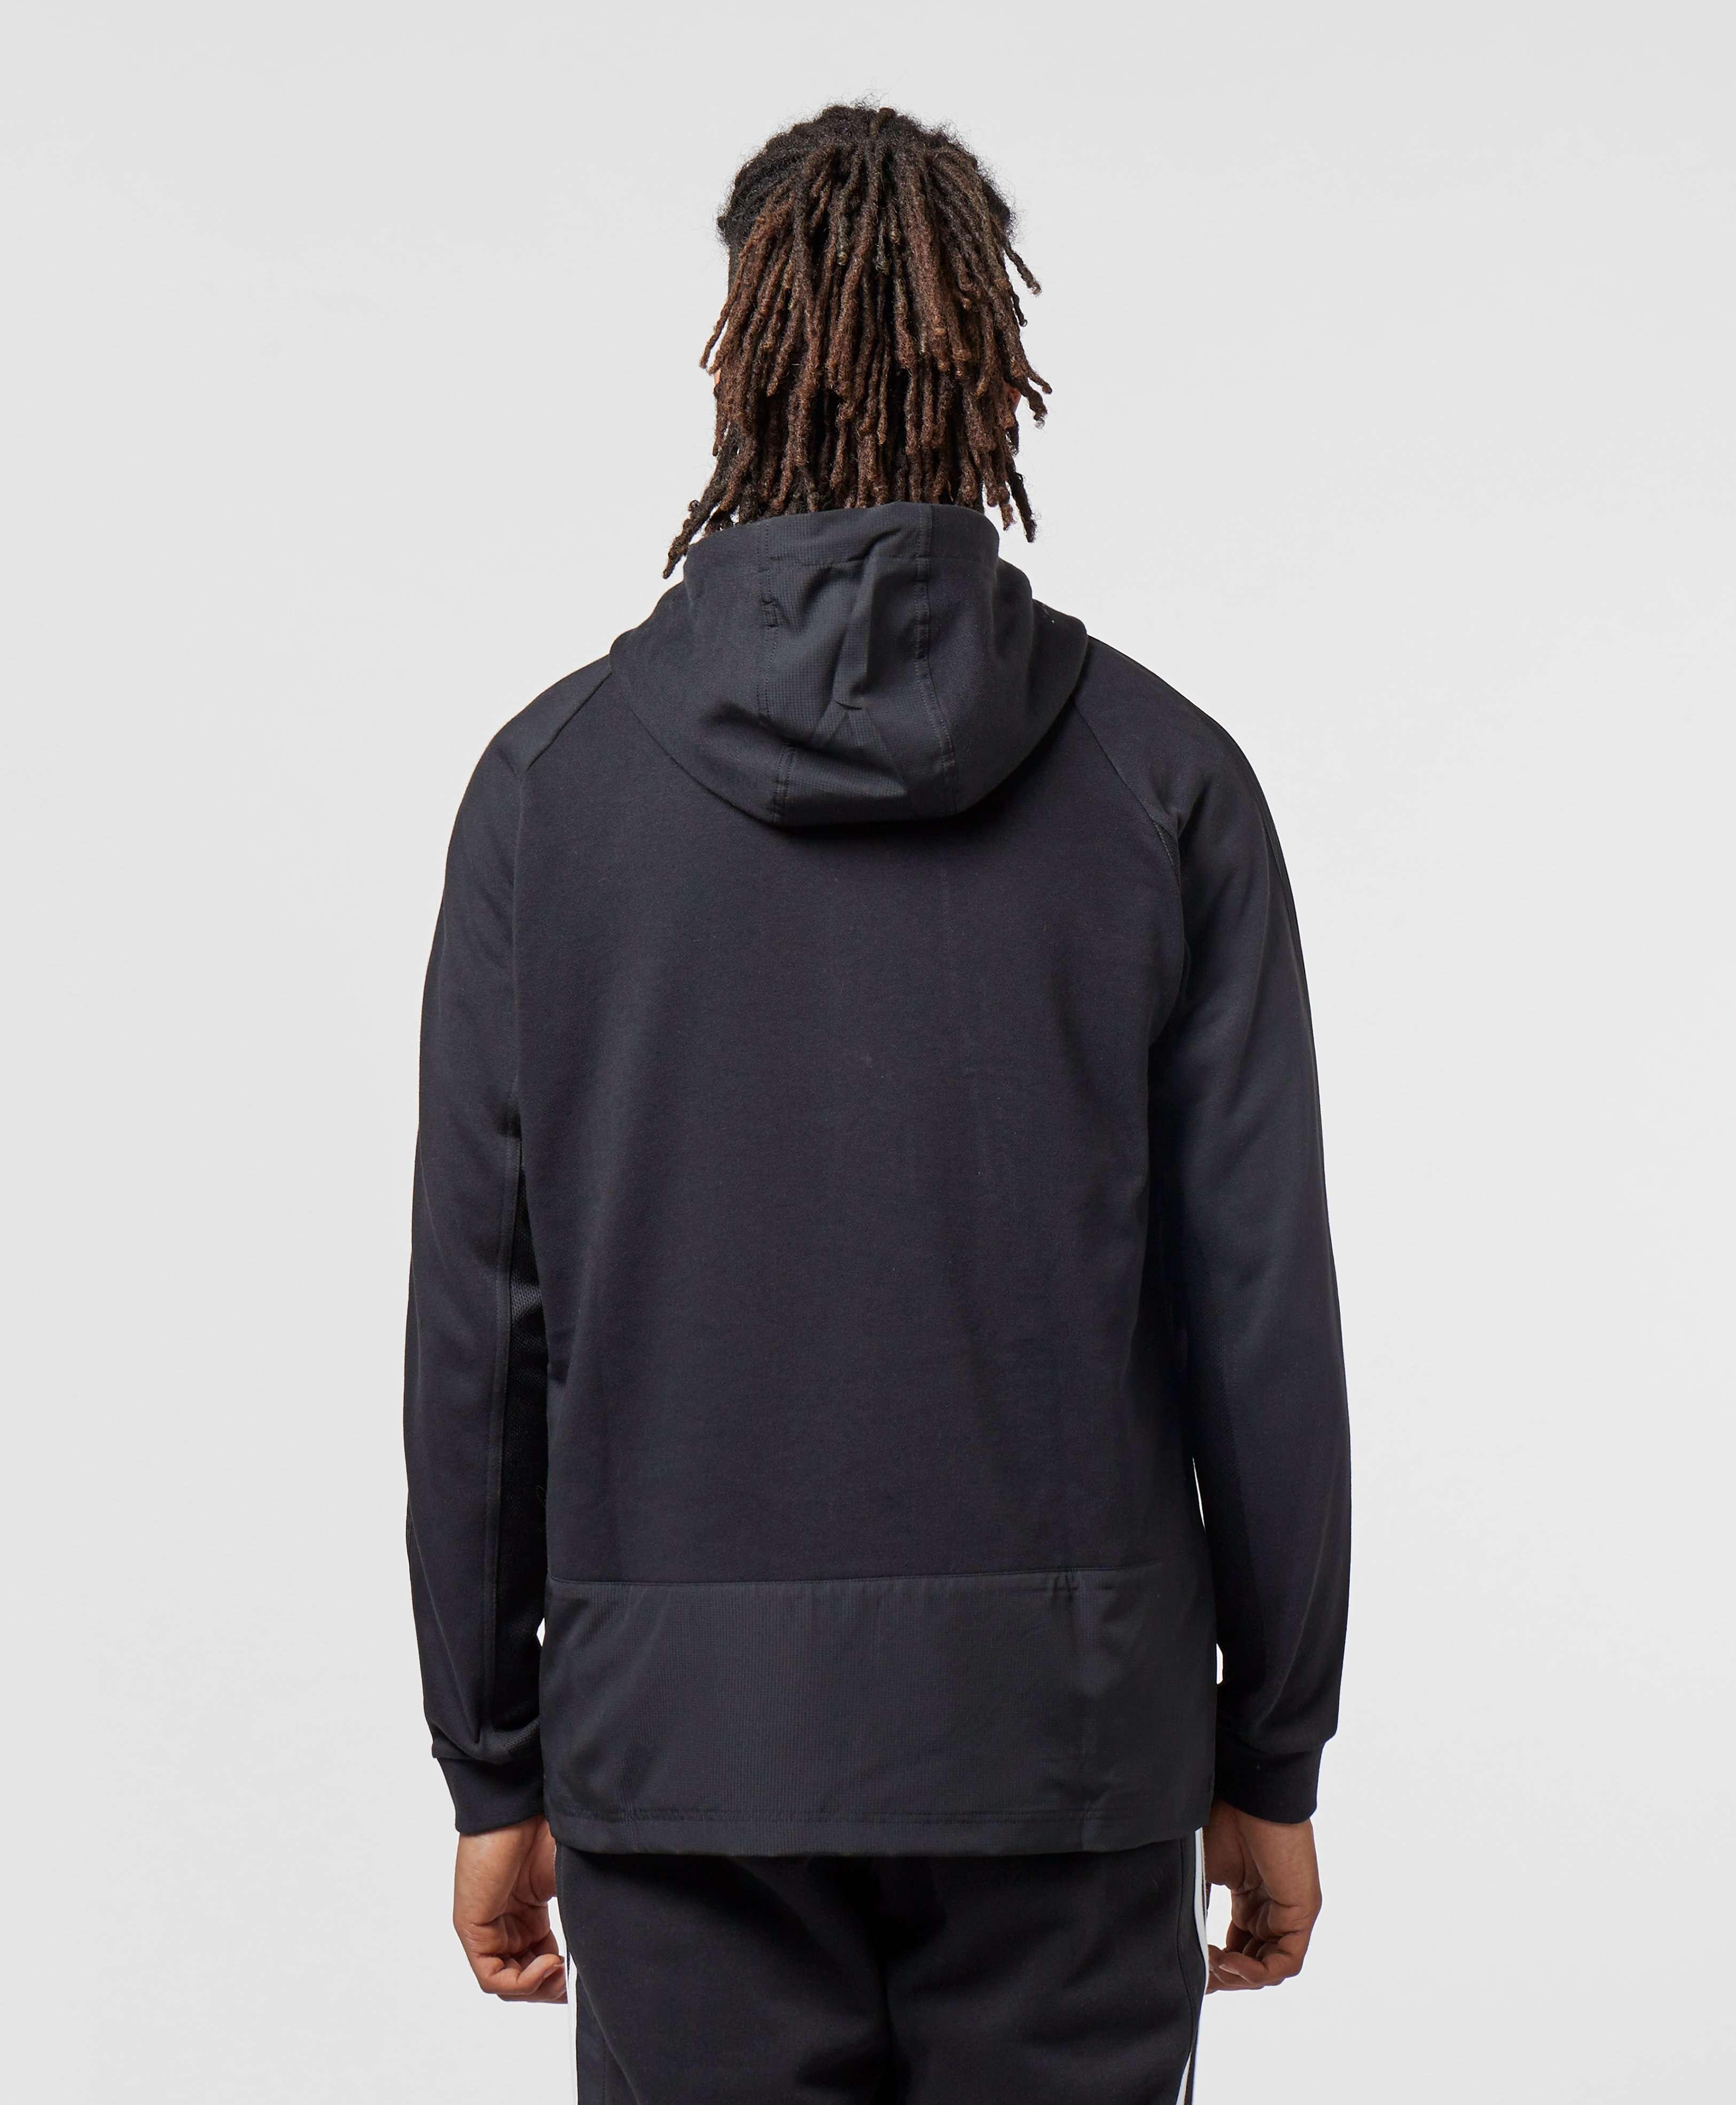 adidas Originals PT3 Full Zip Hoodie